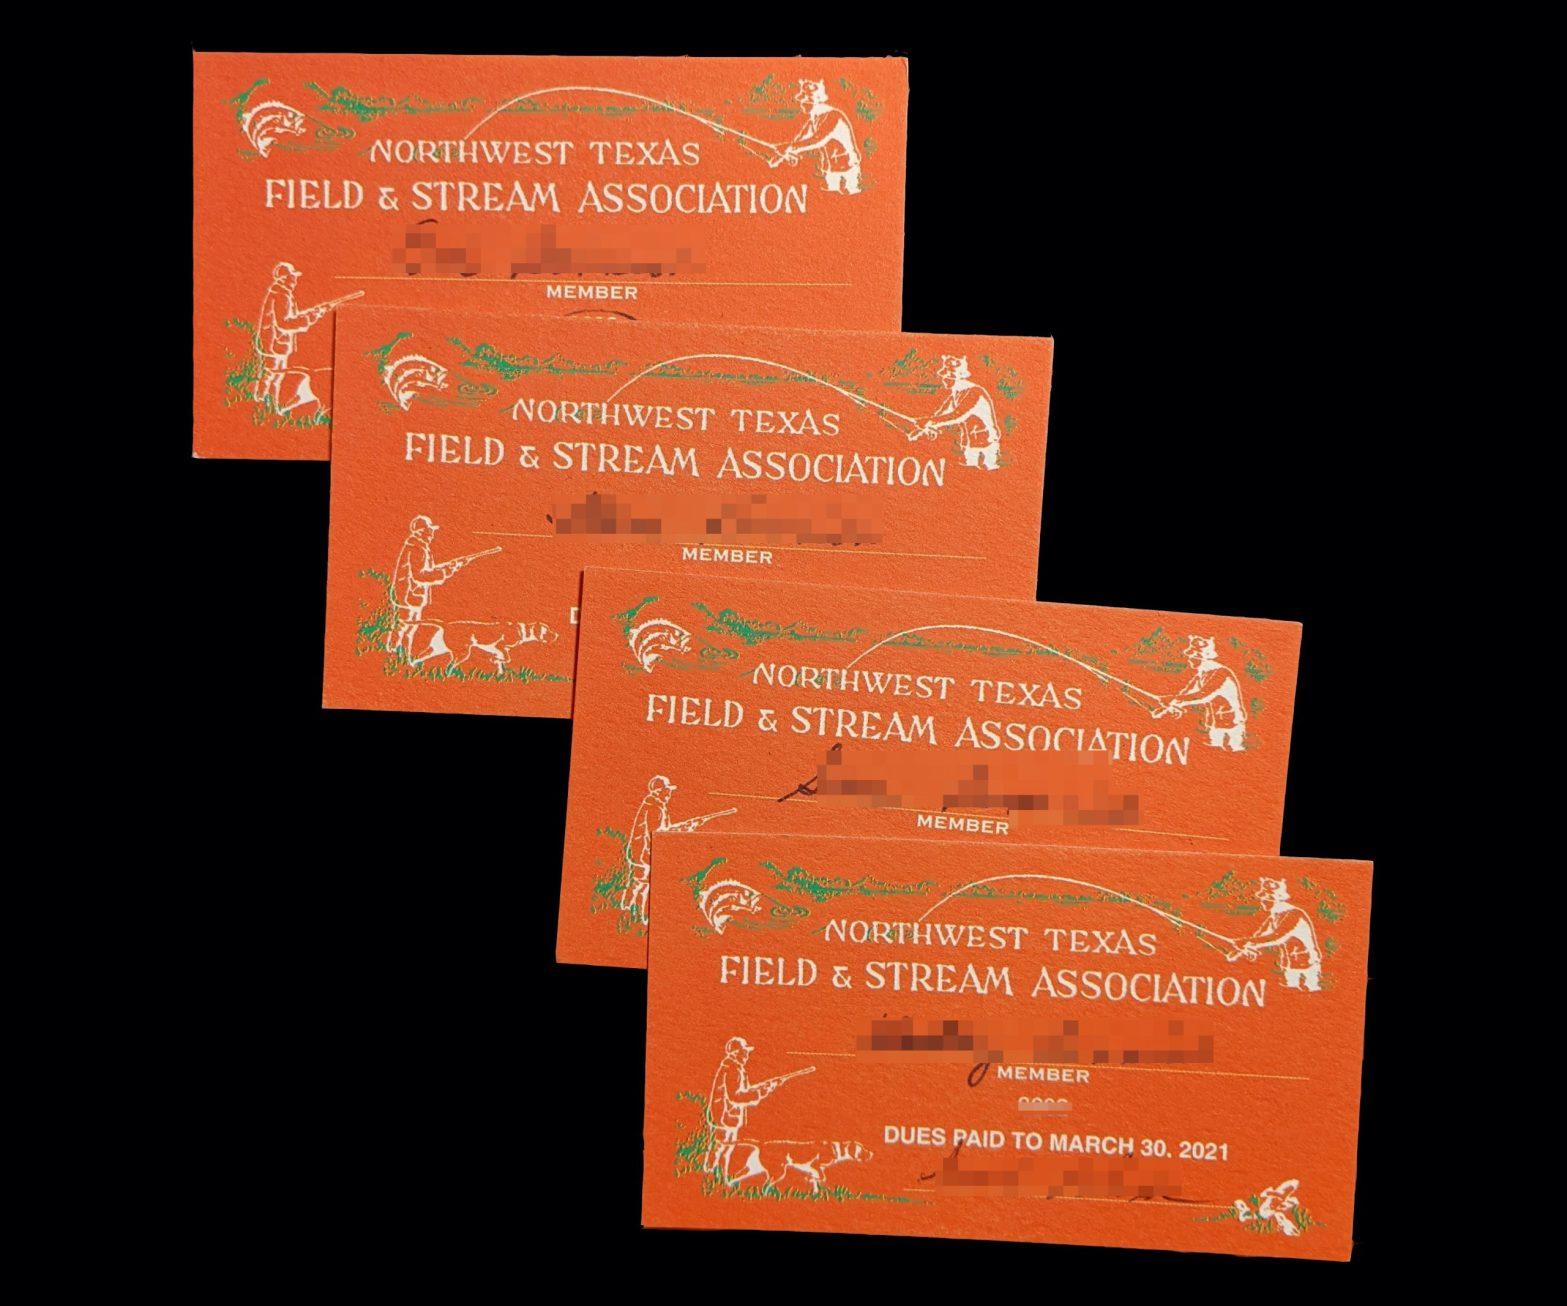 2020 Membership Cards